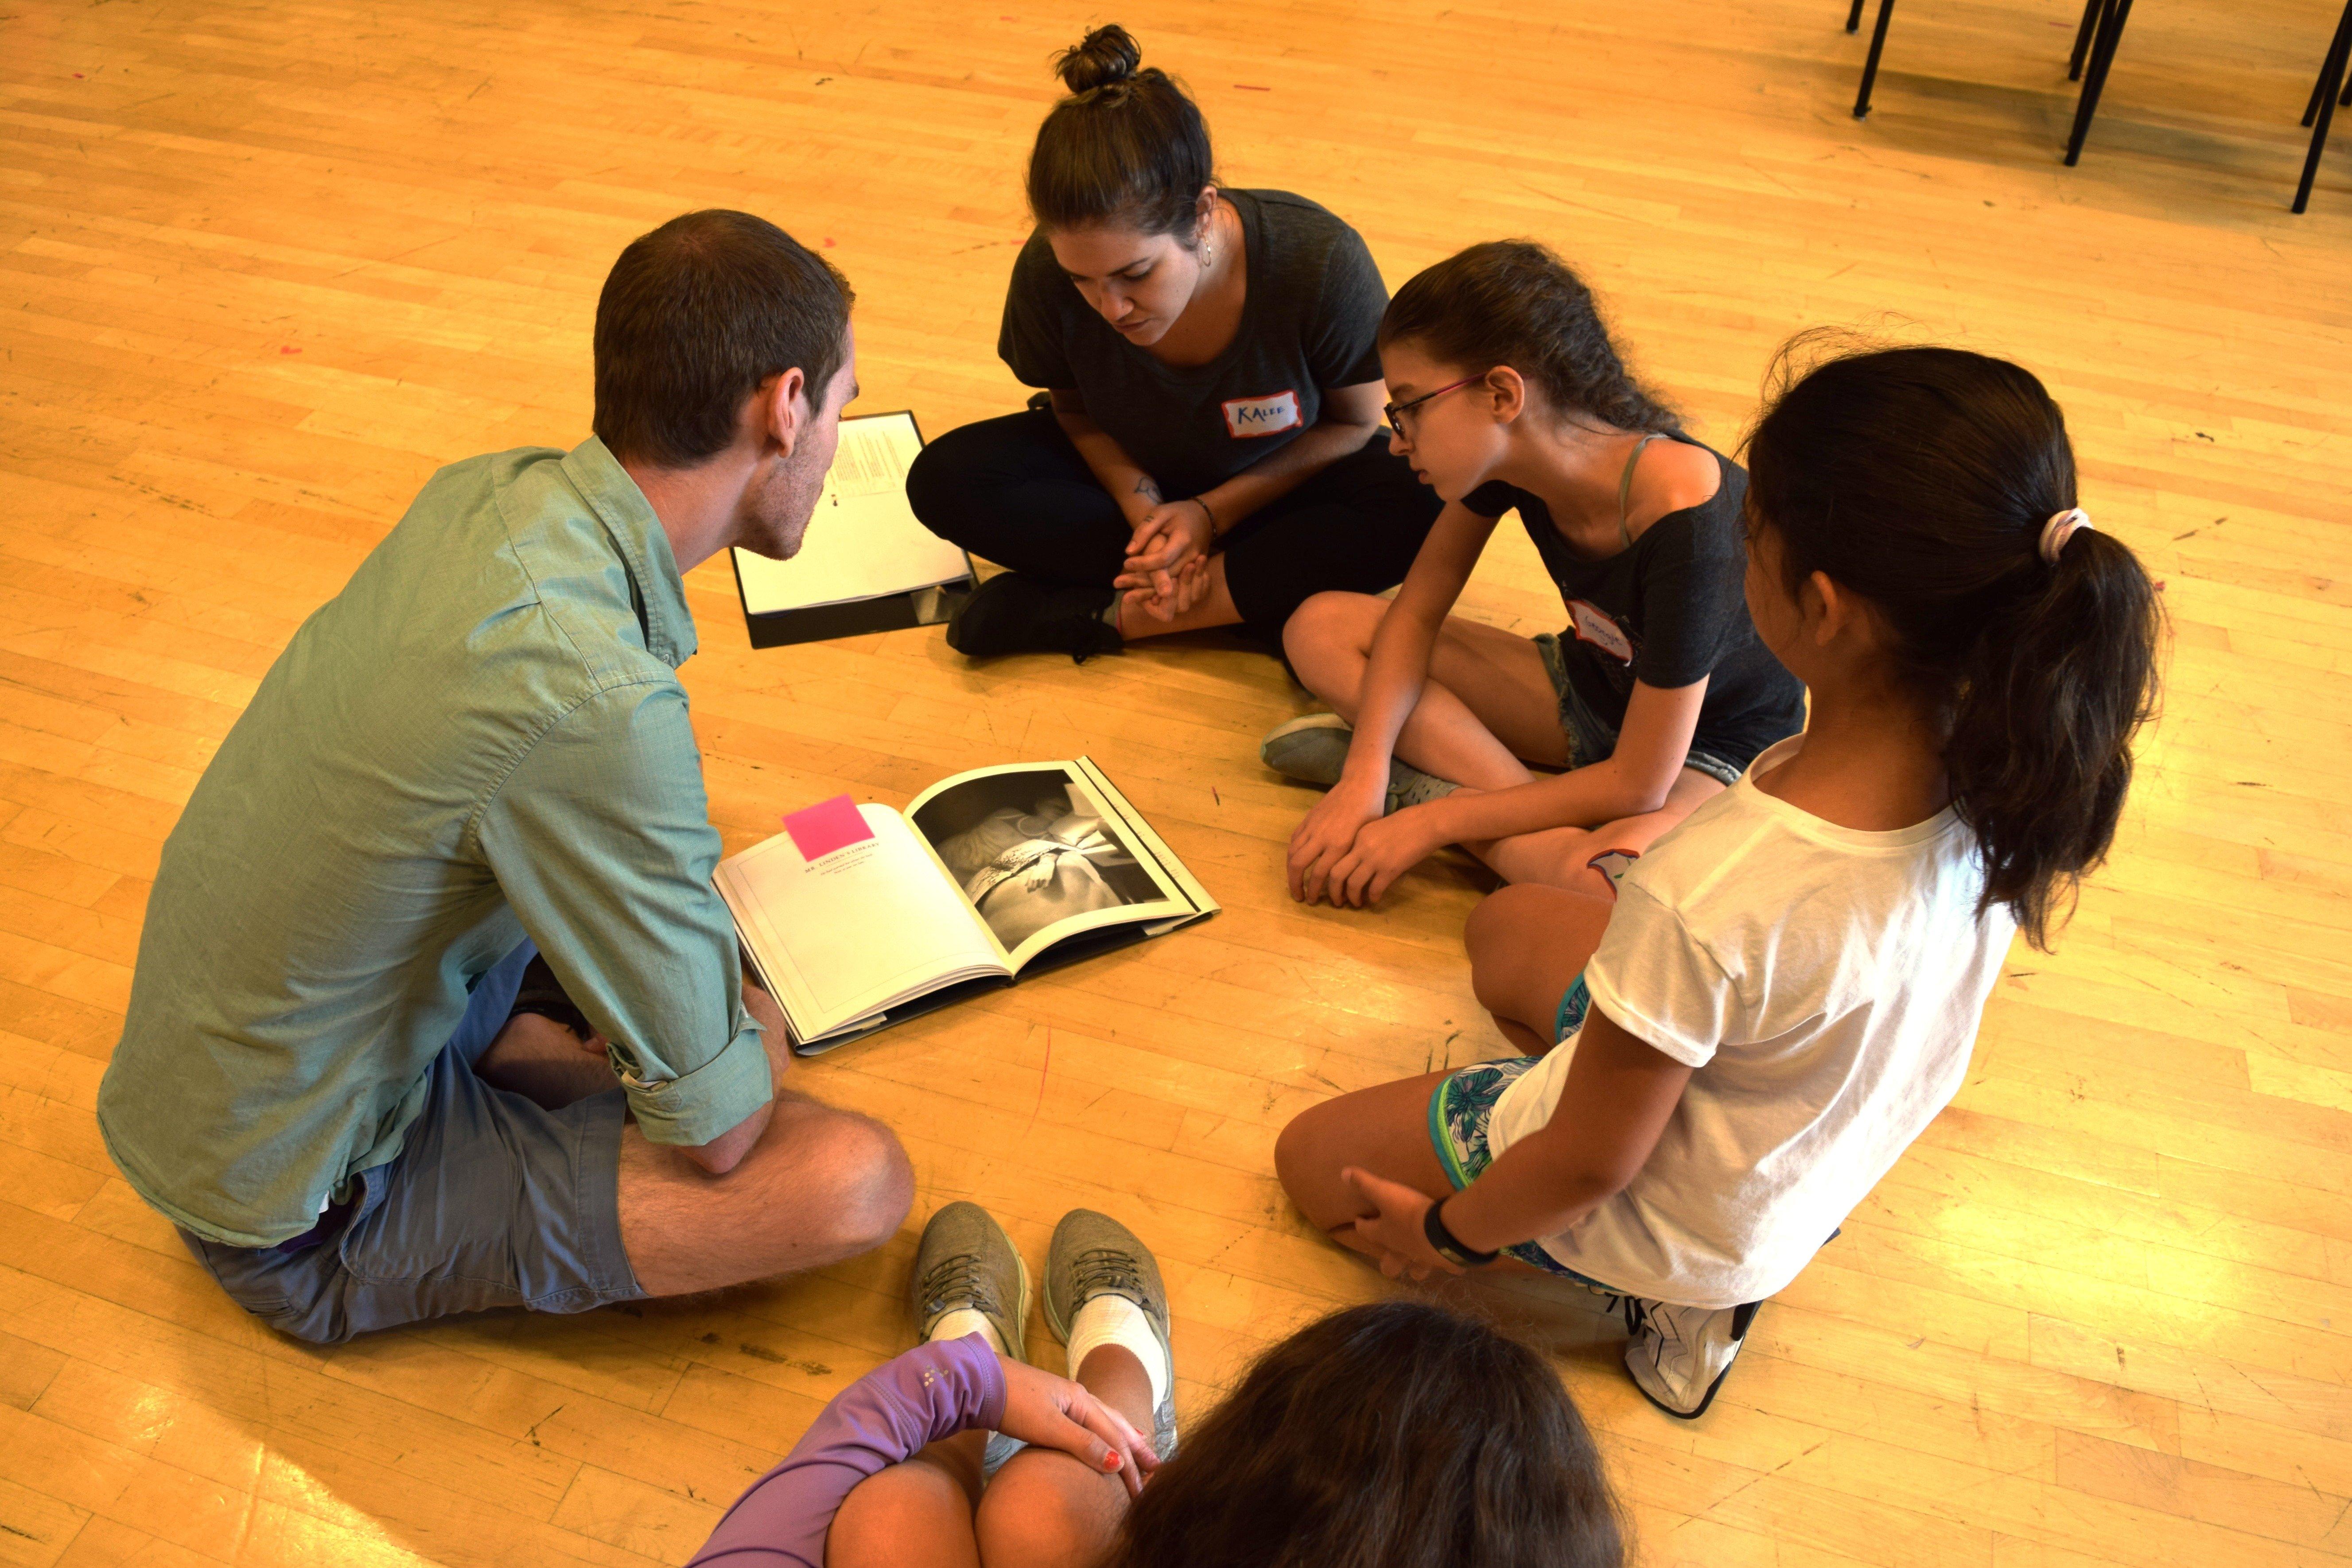 p2_Educ_1 Choosing an Image with Kids